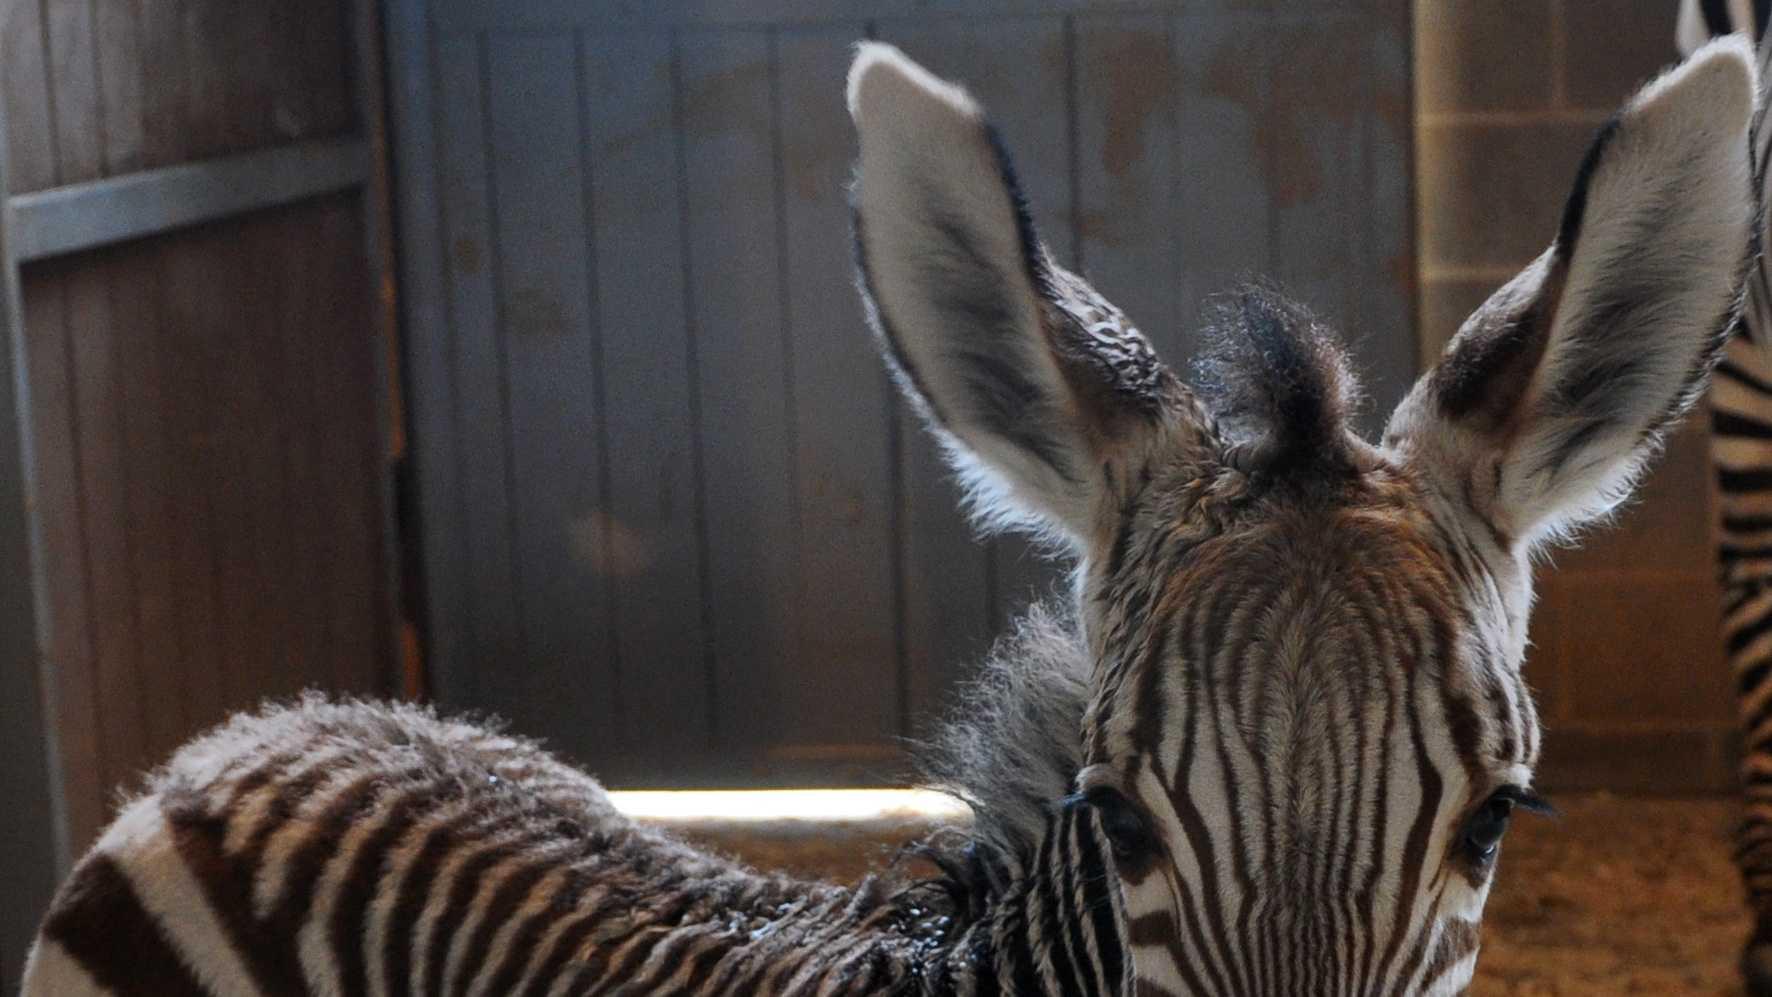 A female zebra foal born at 2:45 a.m. on Jan. 18, 2013. (READ MORE)